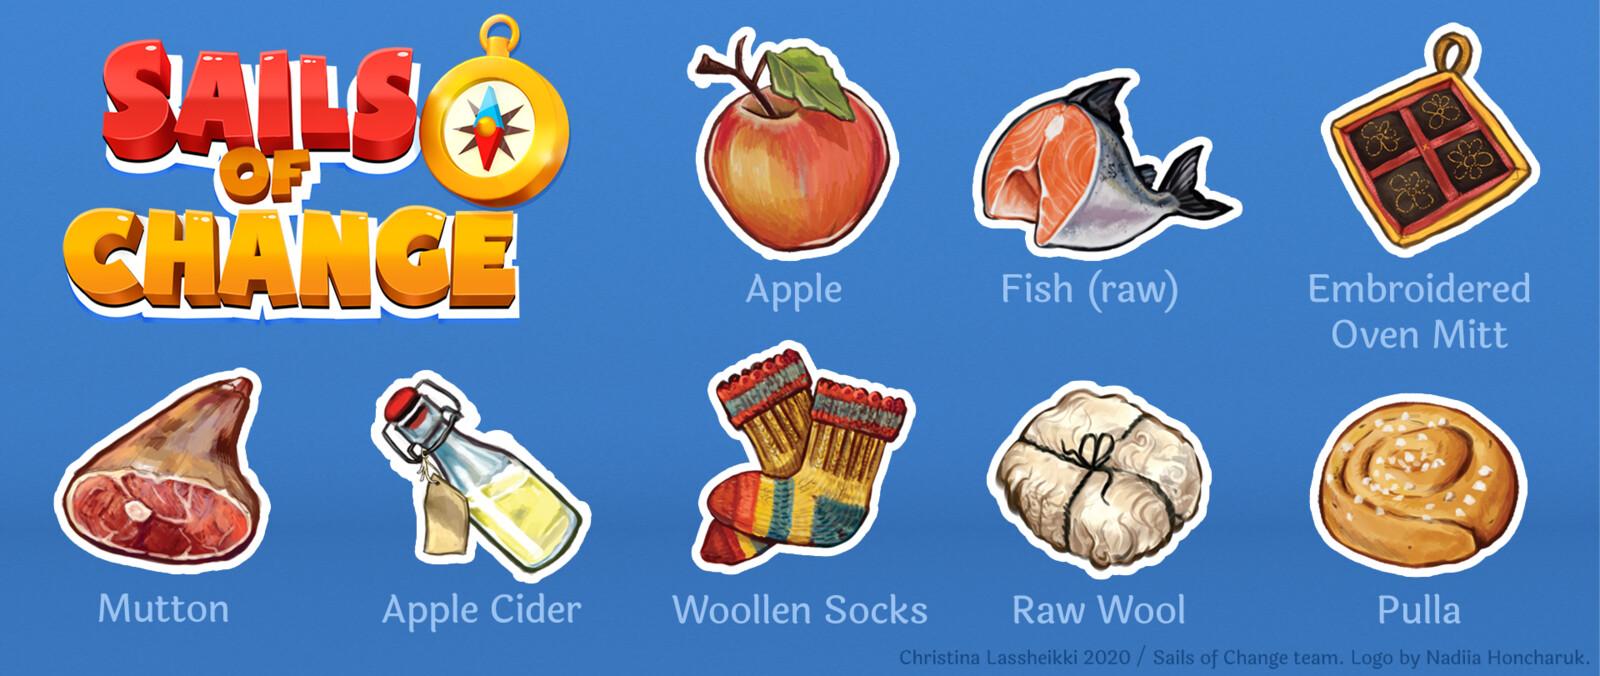 Inventory item illustrations.